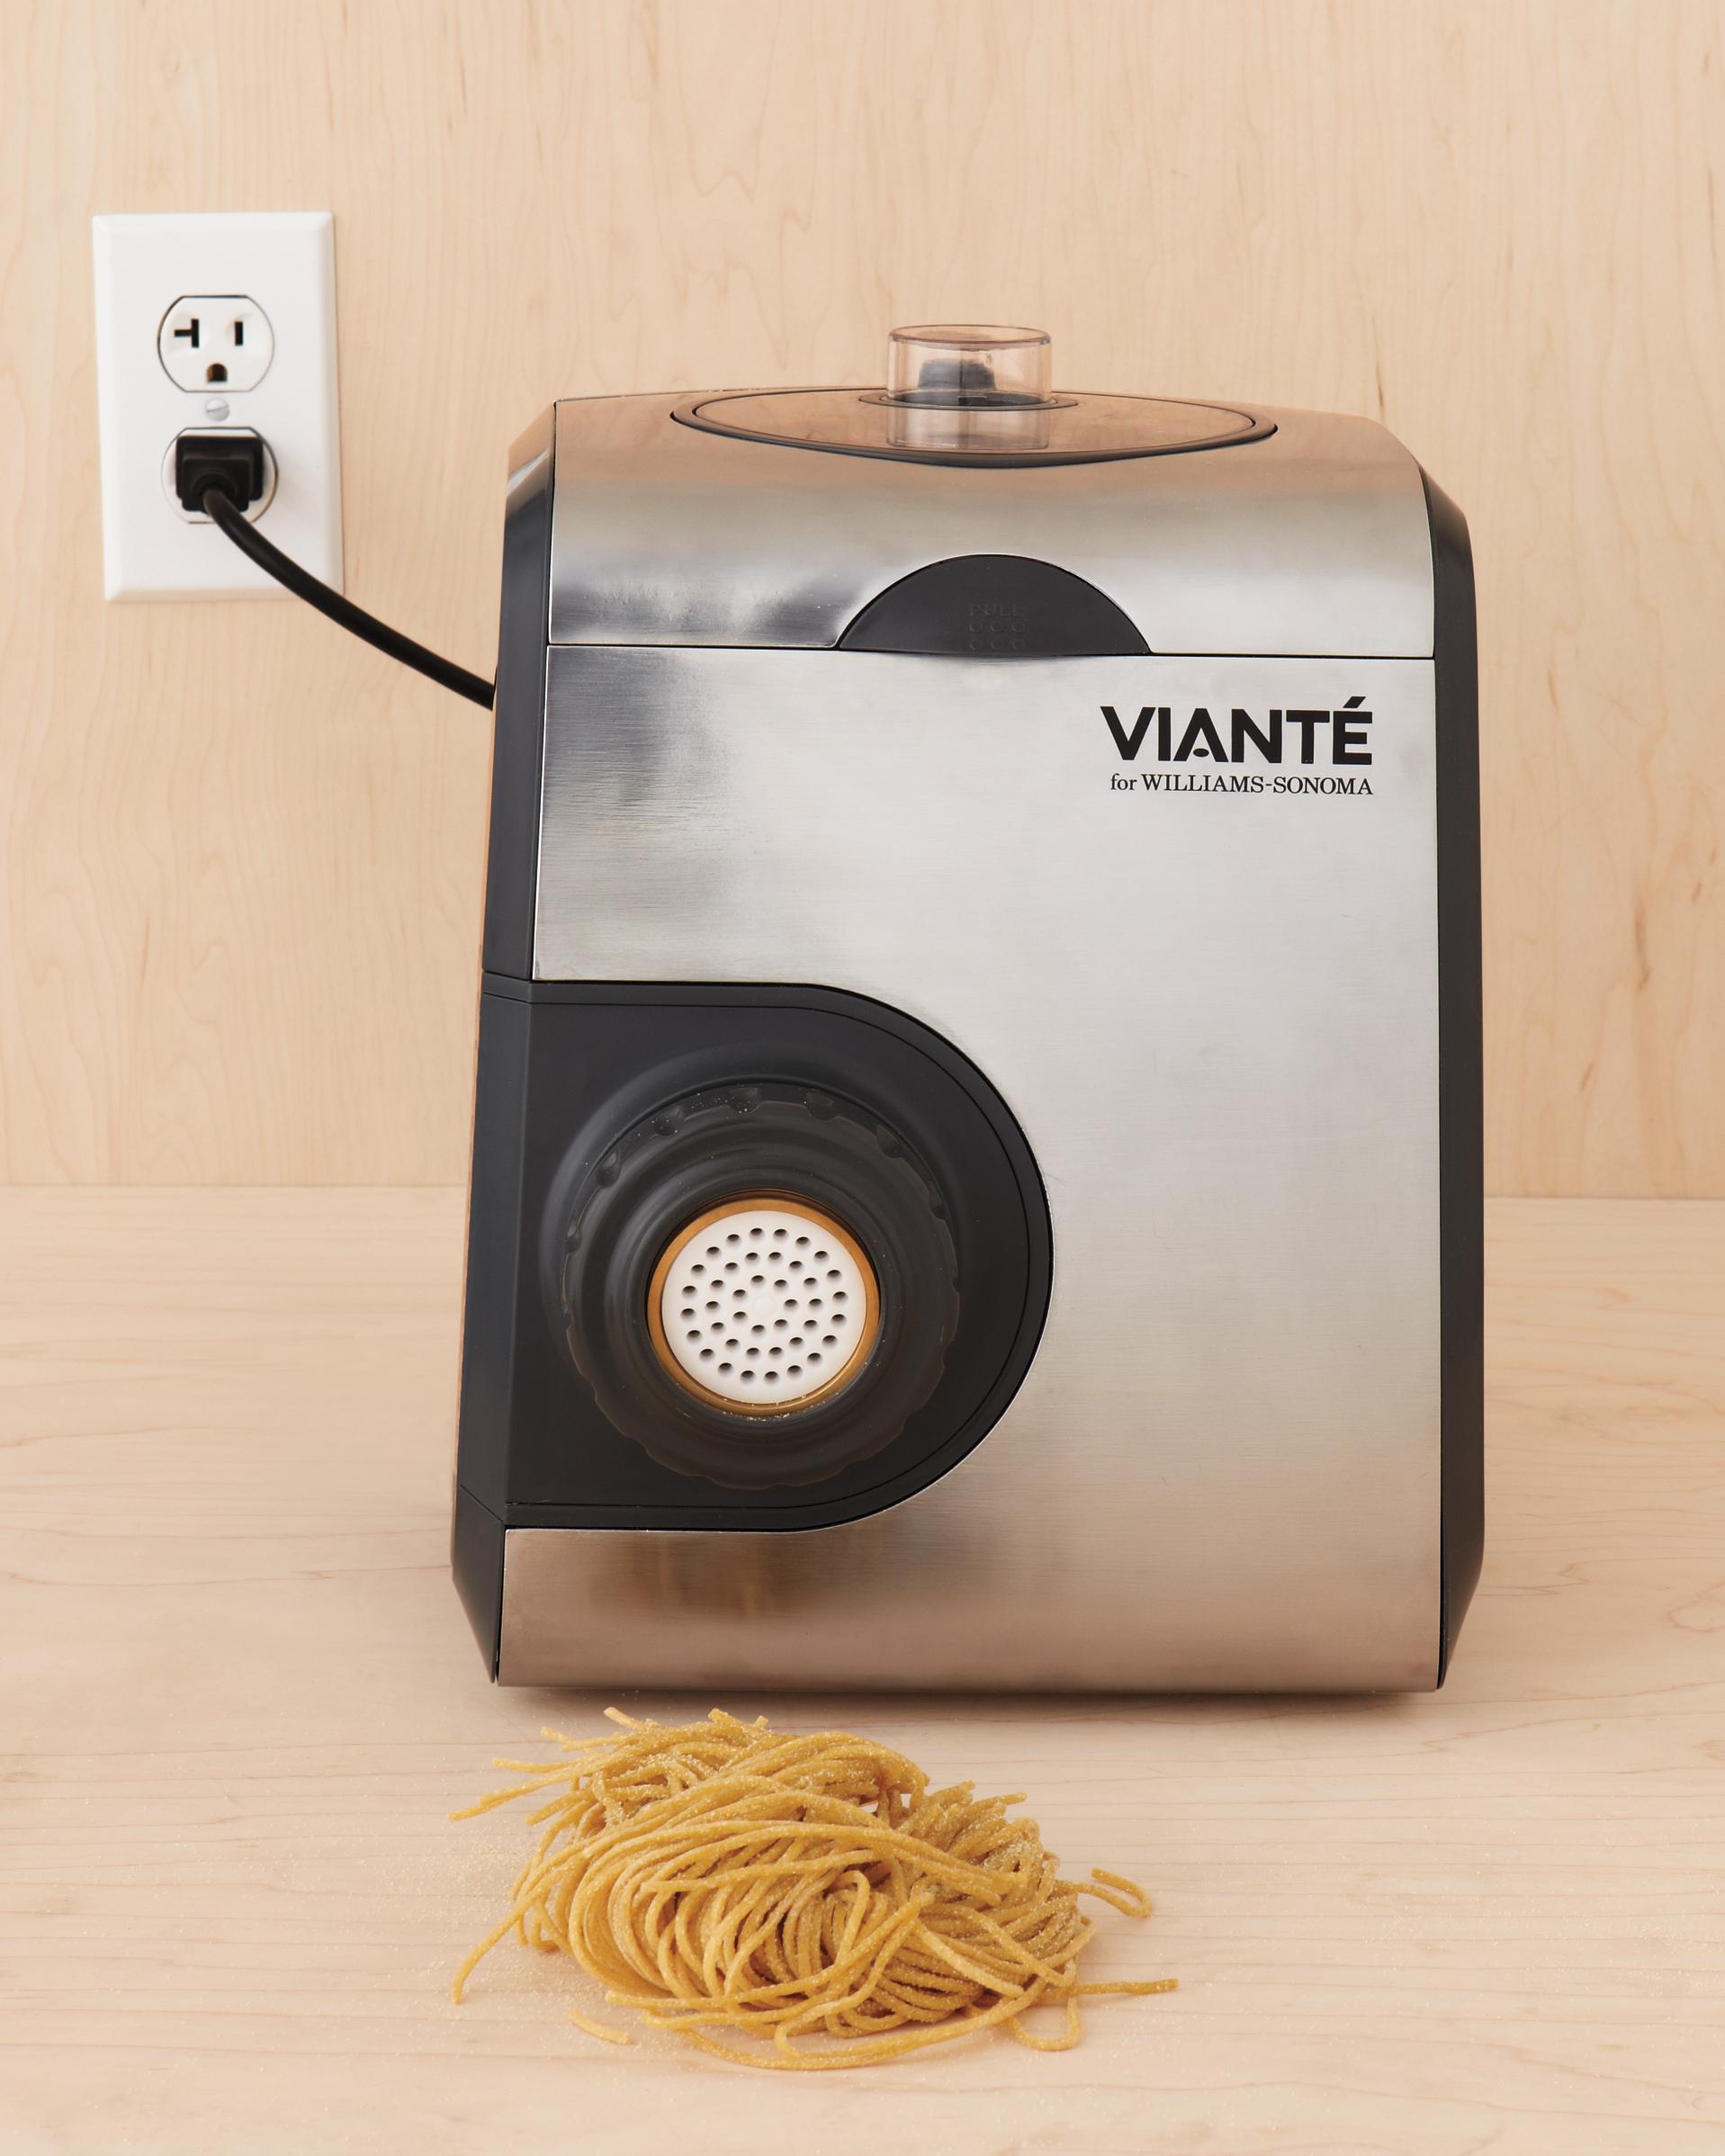 pasta-maker-017-mwd109796.jpg